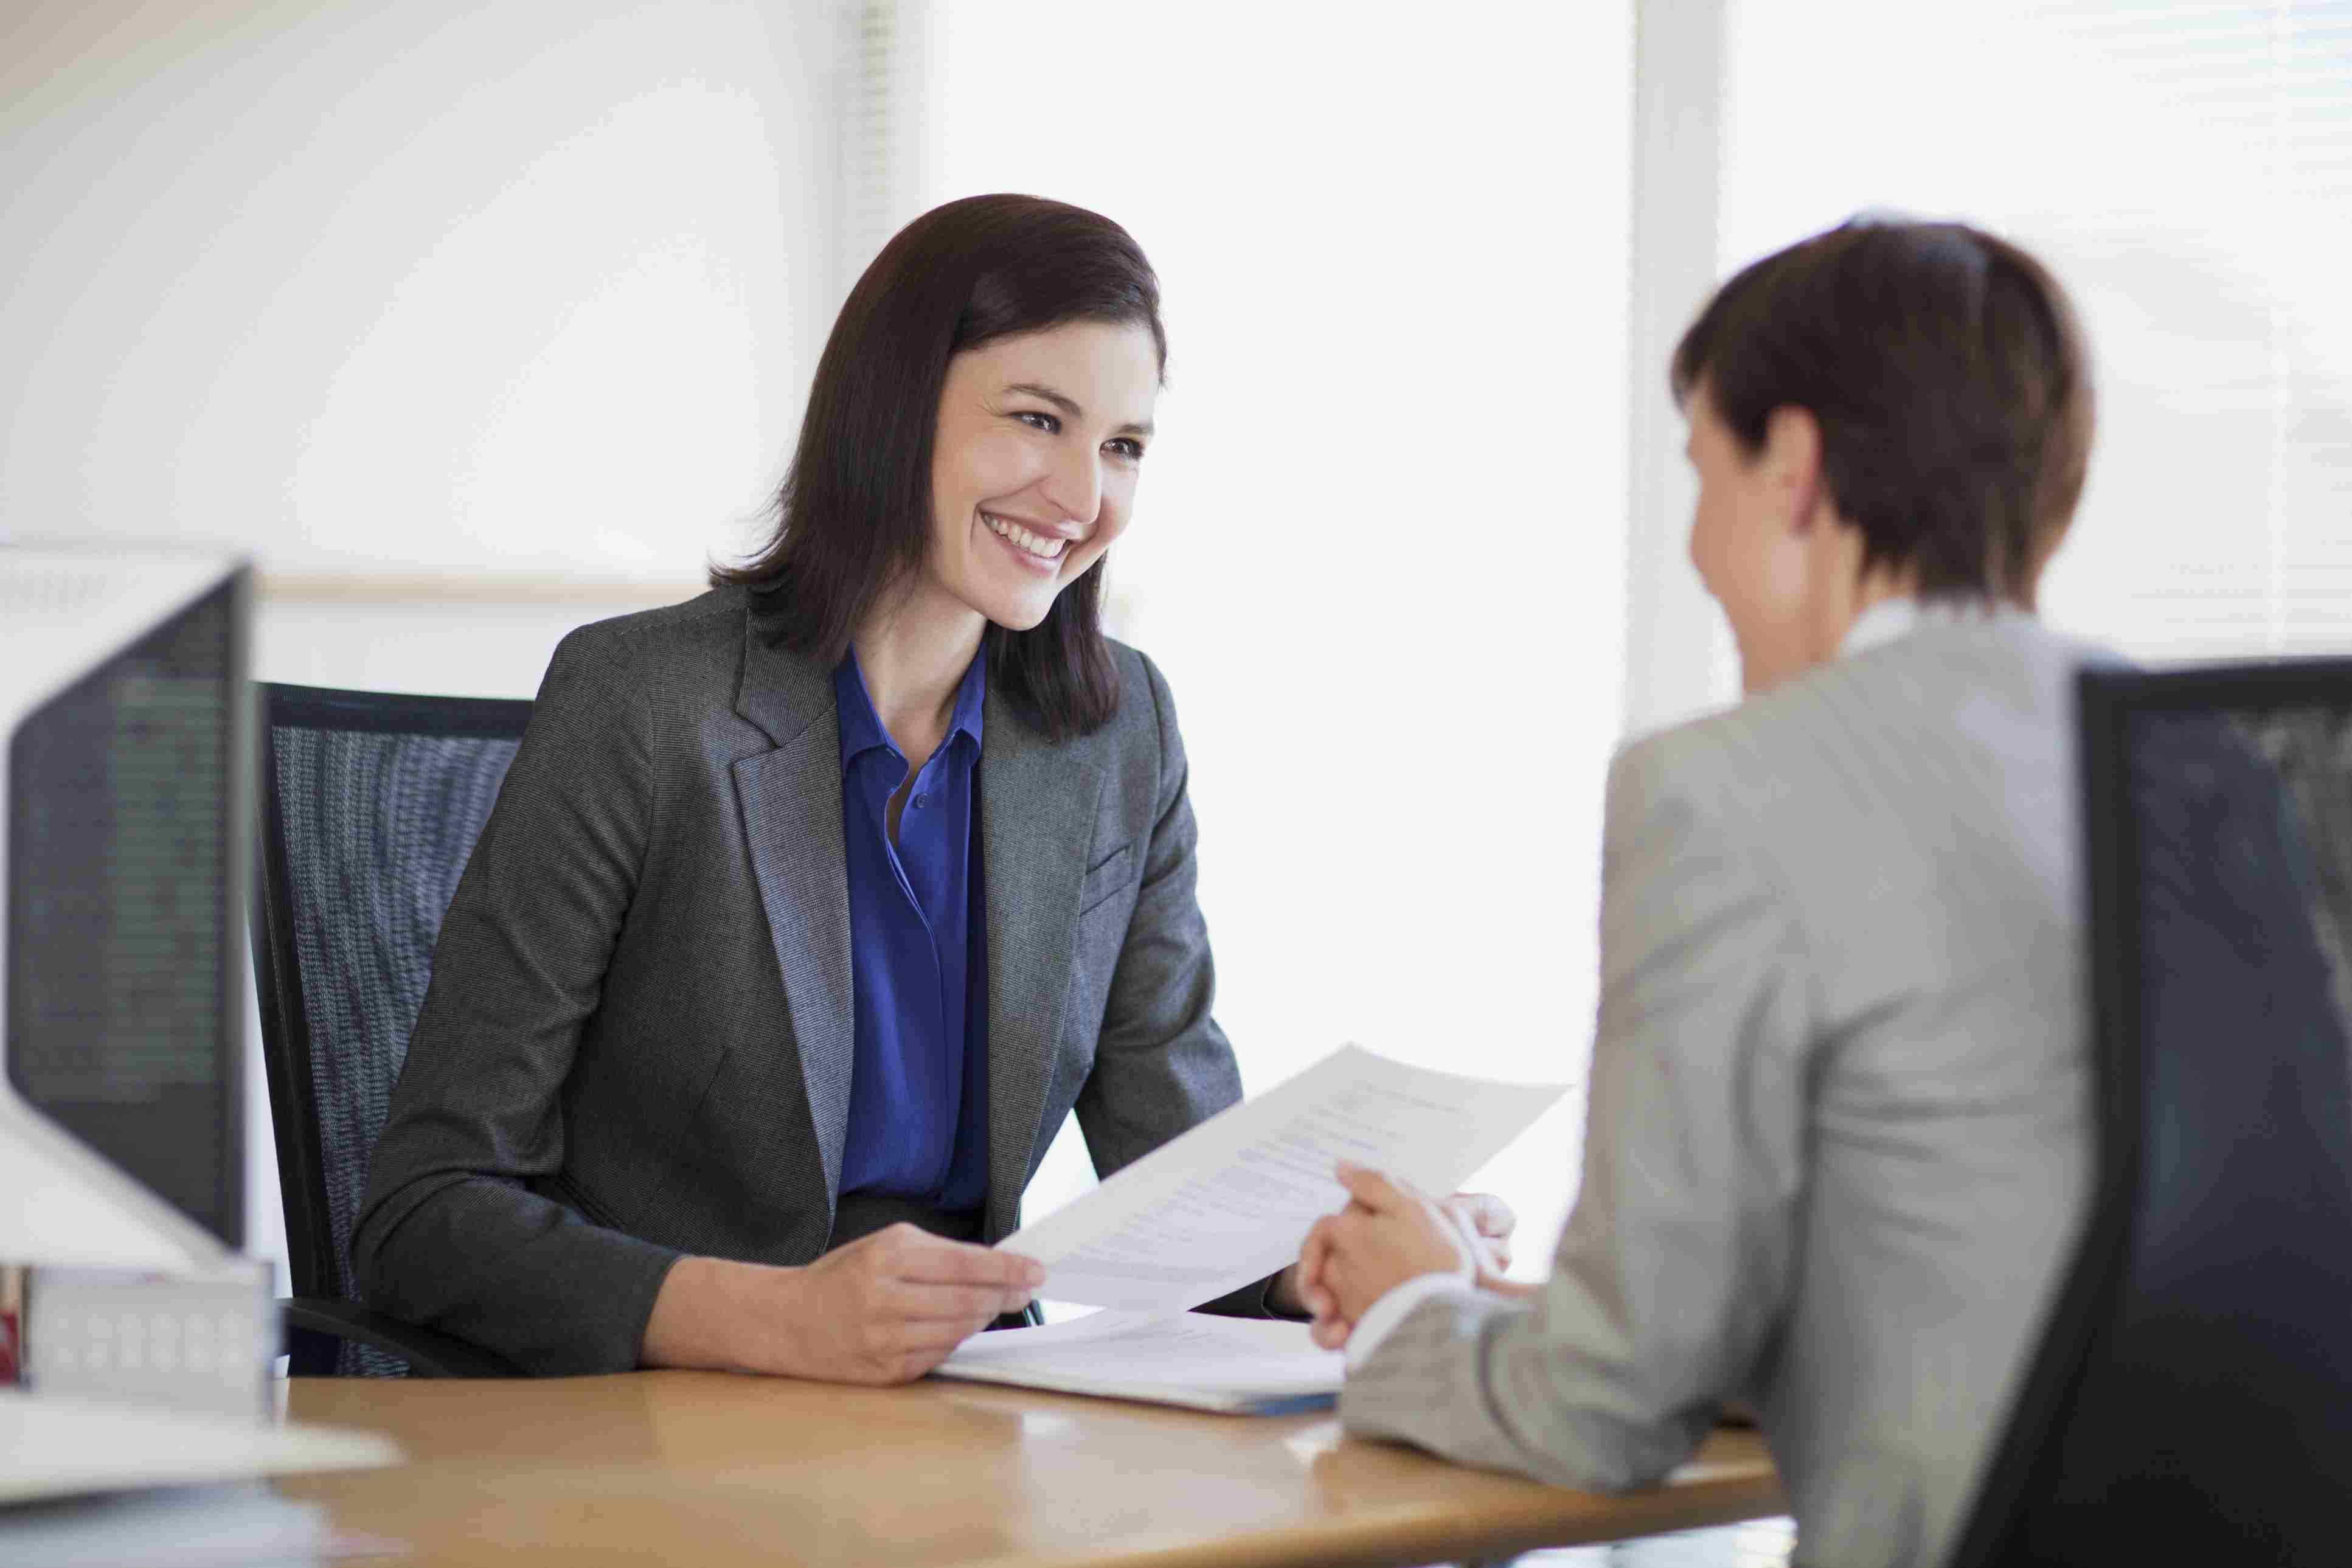 A women conducts a job interview